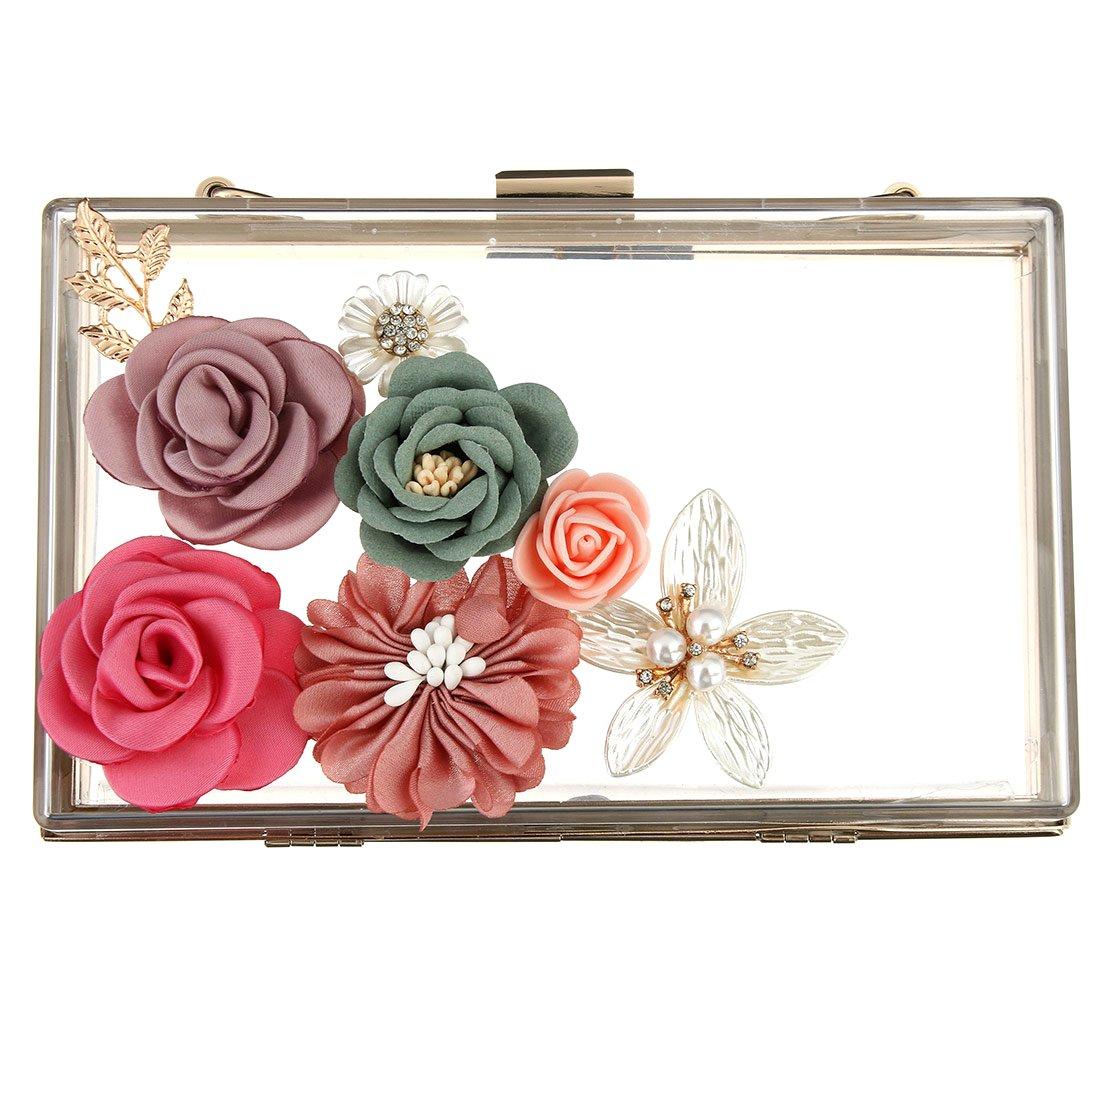 96b68c076aba Acrylic Clutch Bag Womens Flower Transparent Evening Clutches Clear Wedding  Handbag  Amazon.co.uk  Clothing